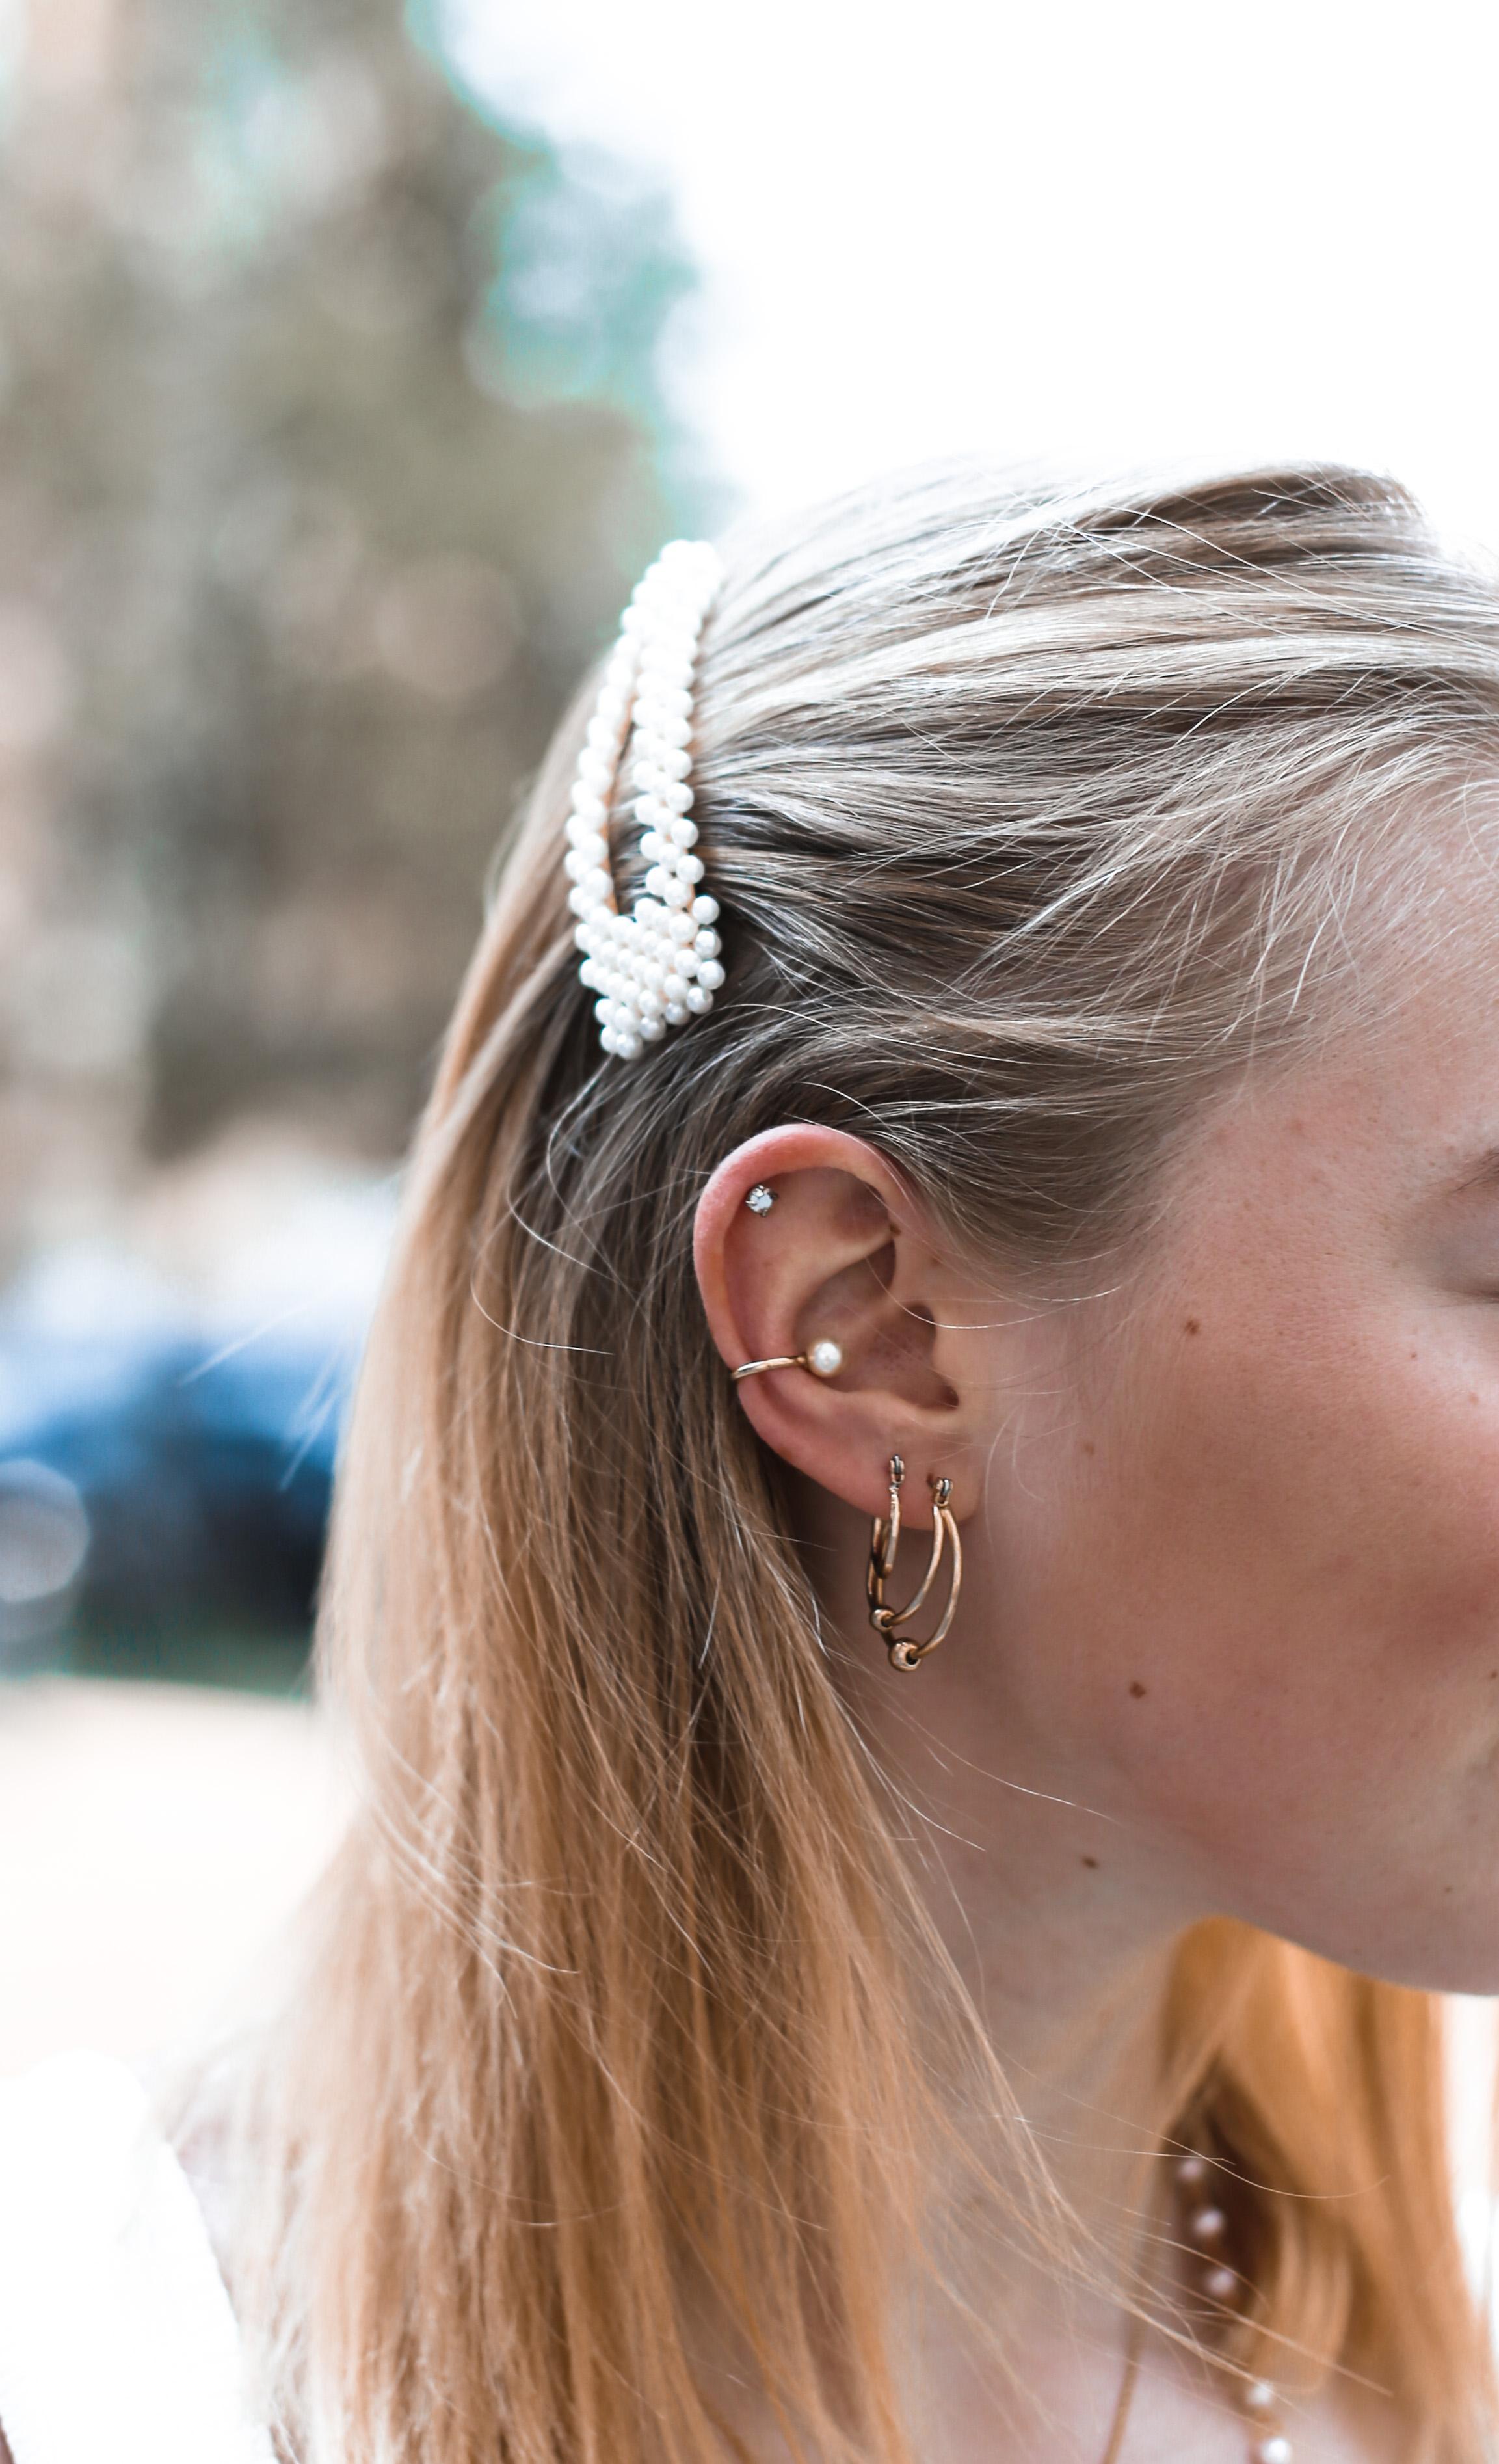 paperbag-hose-outfit-haarspange-mit-perlen